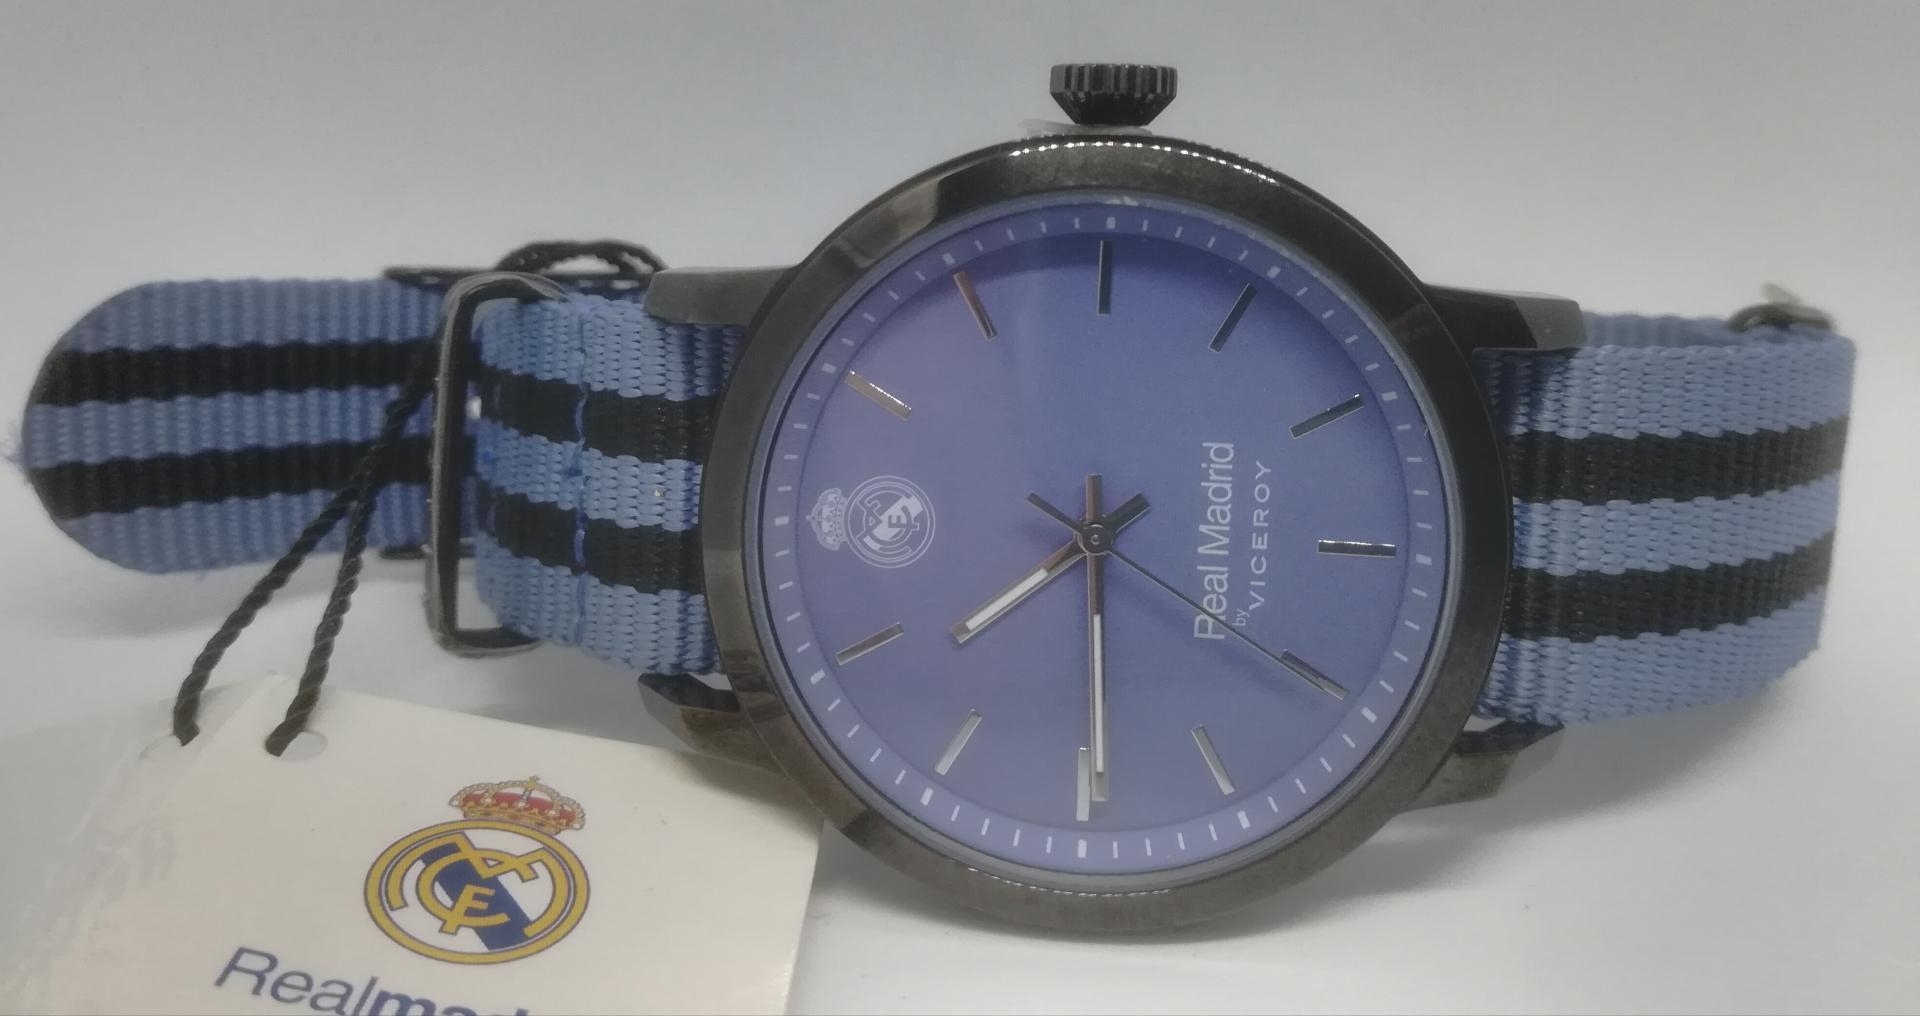 Reloj Real Madrid Hombre Modelo Oficial De Viceroy 40969-39